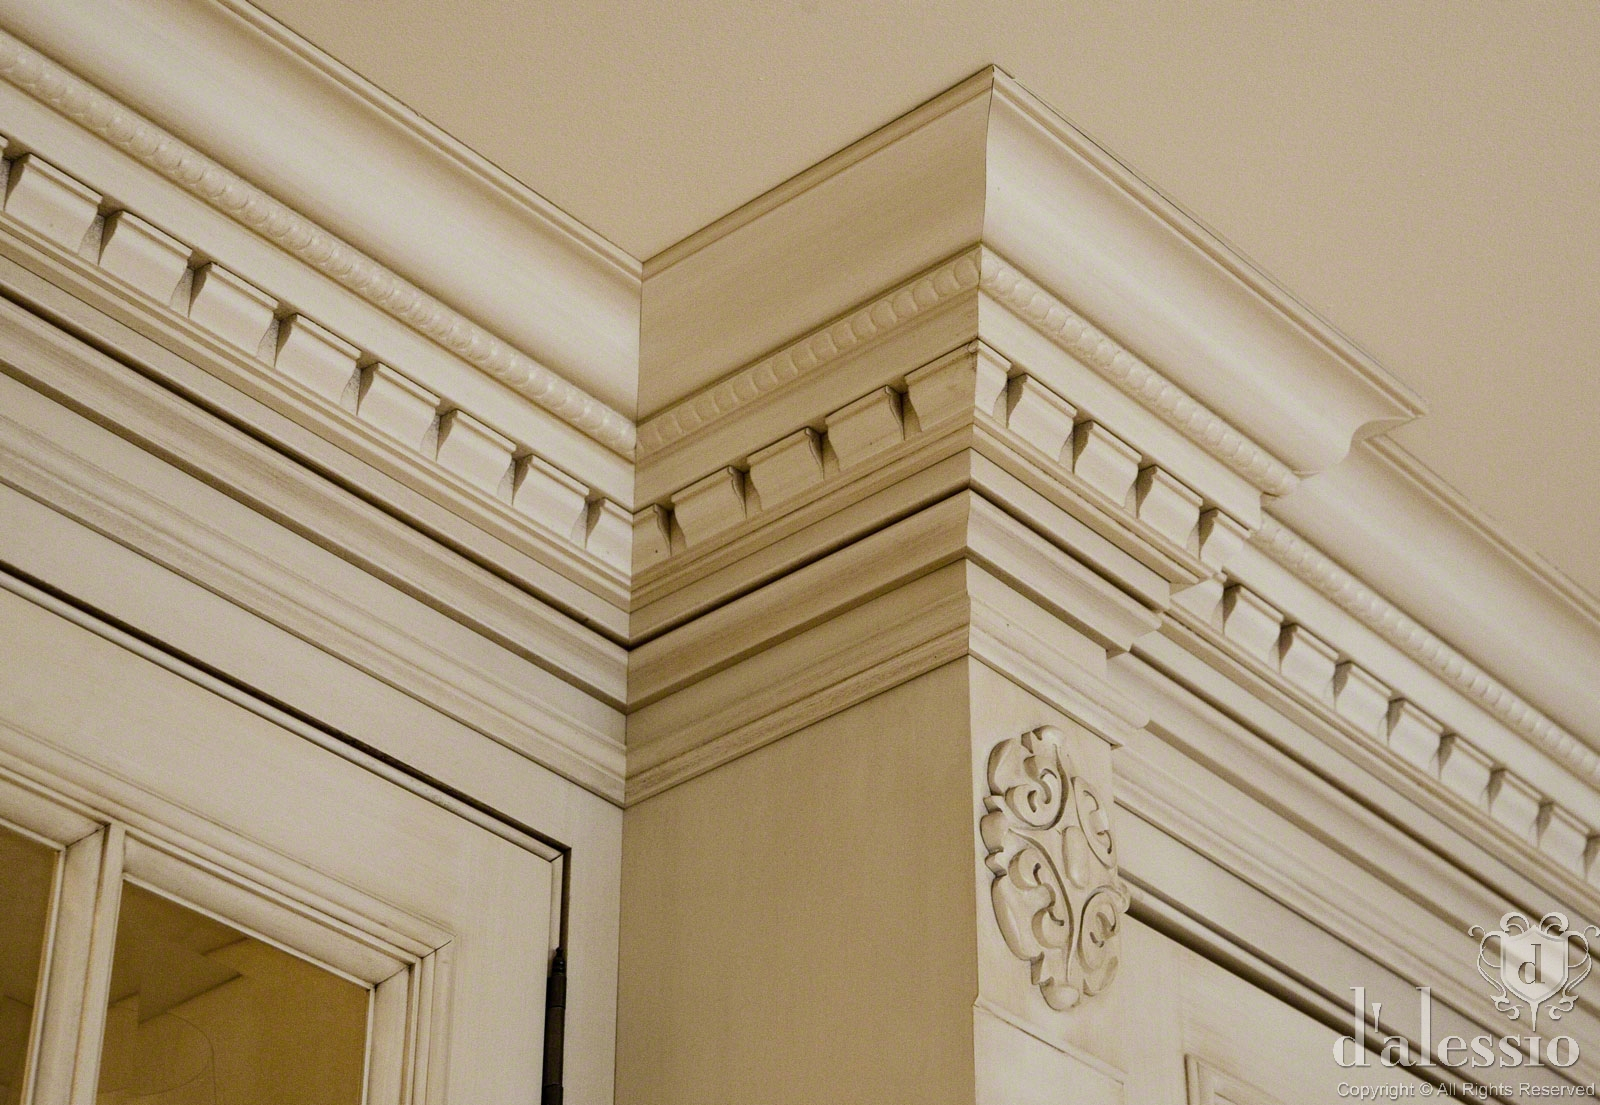 D'Alessio Custom Architectural Millwork Design Services